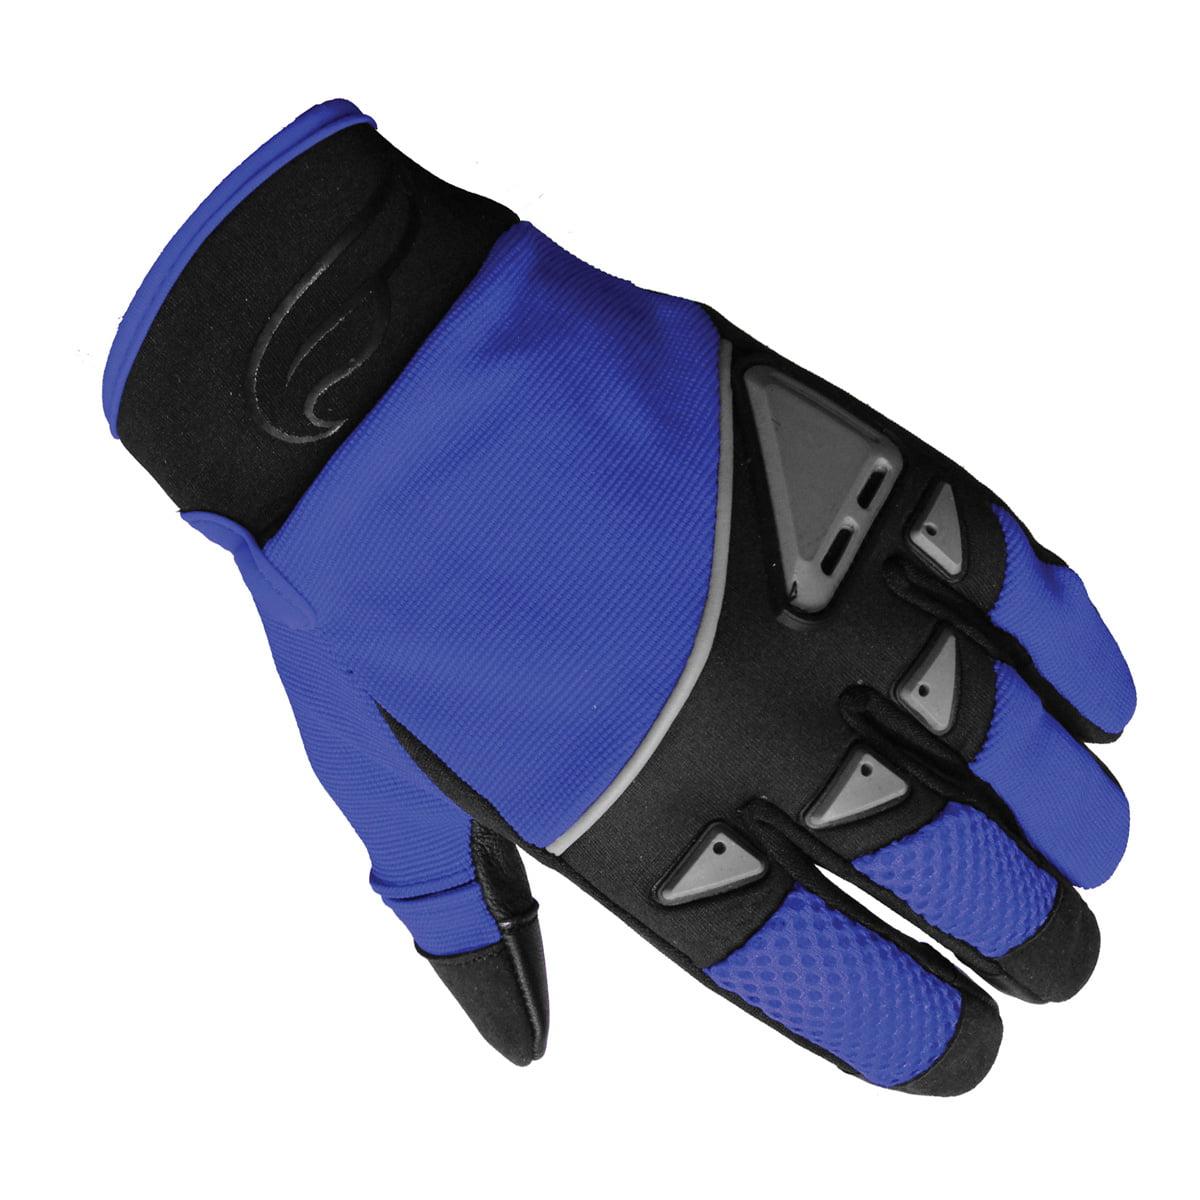 Men's Fulmer GT92 Gel Palm Gloves Motorcycle Riding MX Dirt Bike BMX ATV Trail